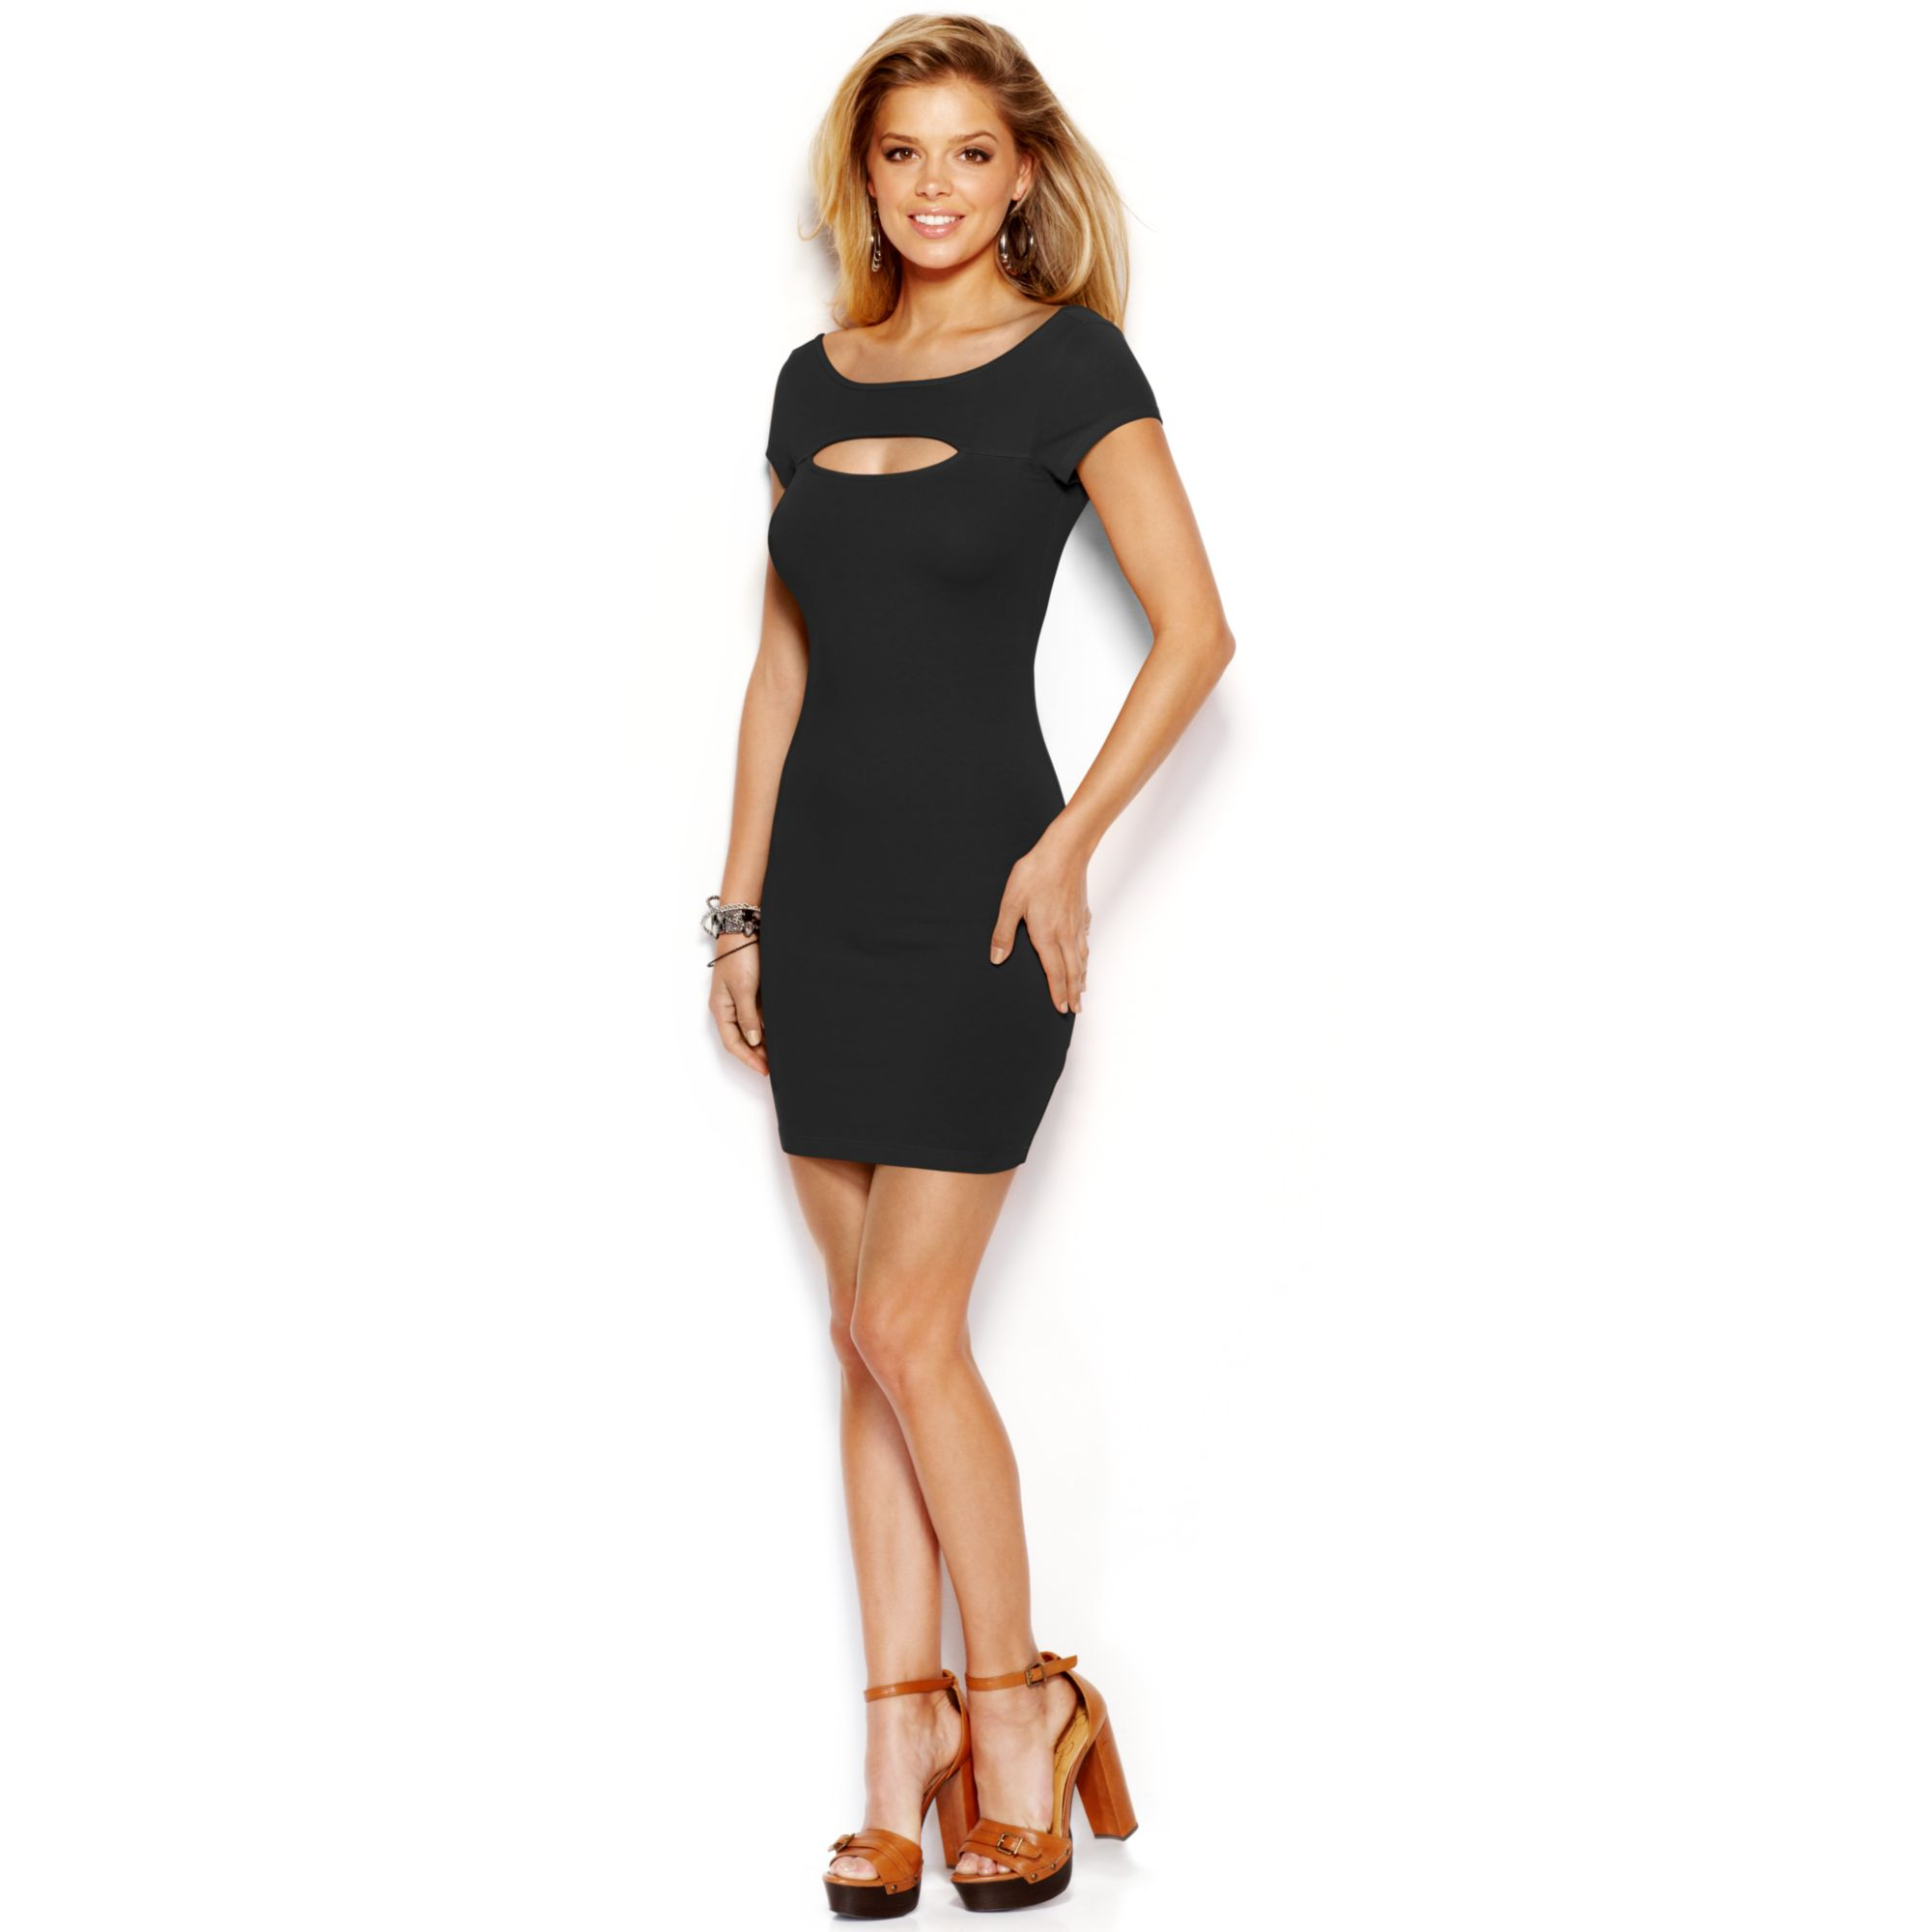 Lyst Guess Shortsleeve Cutout Bodycon Dress In Black